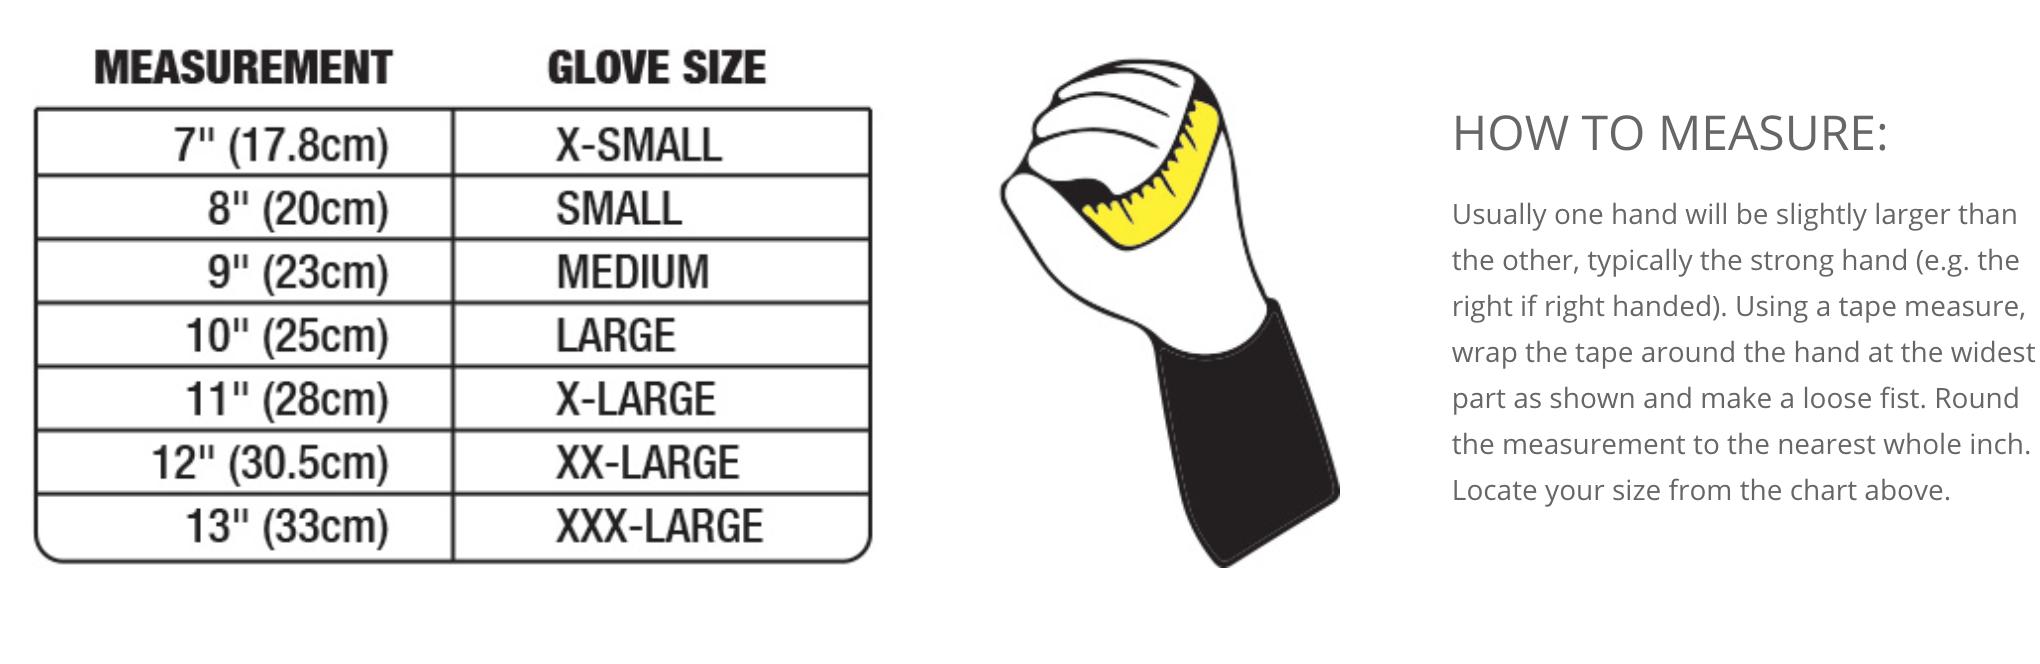 glove-size-calculator2.png